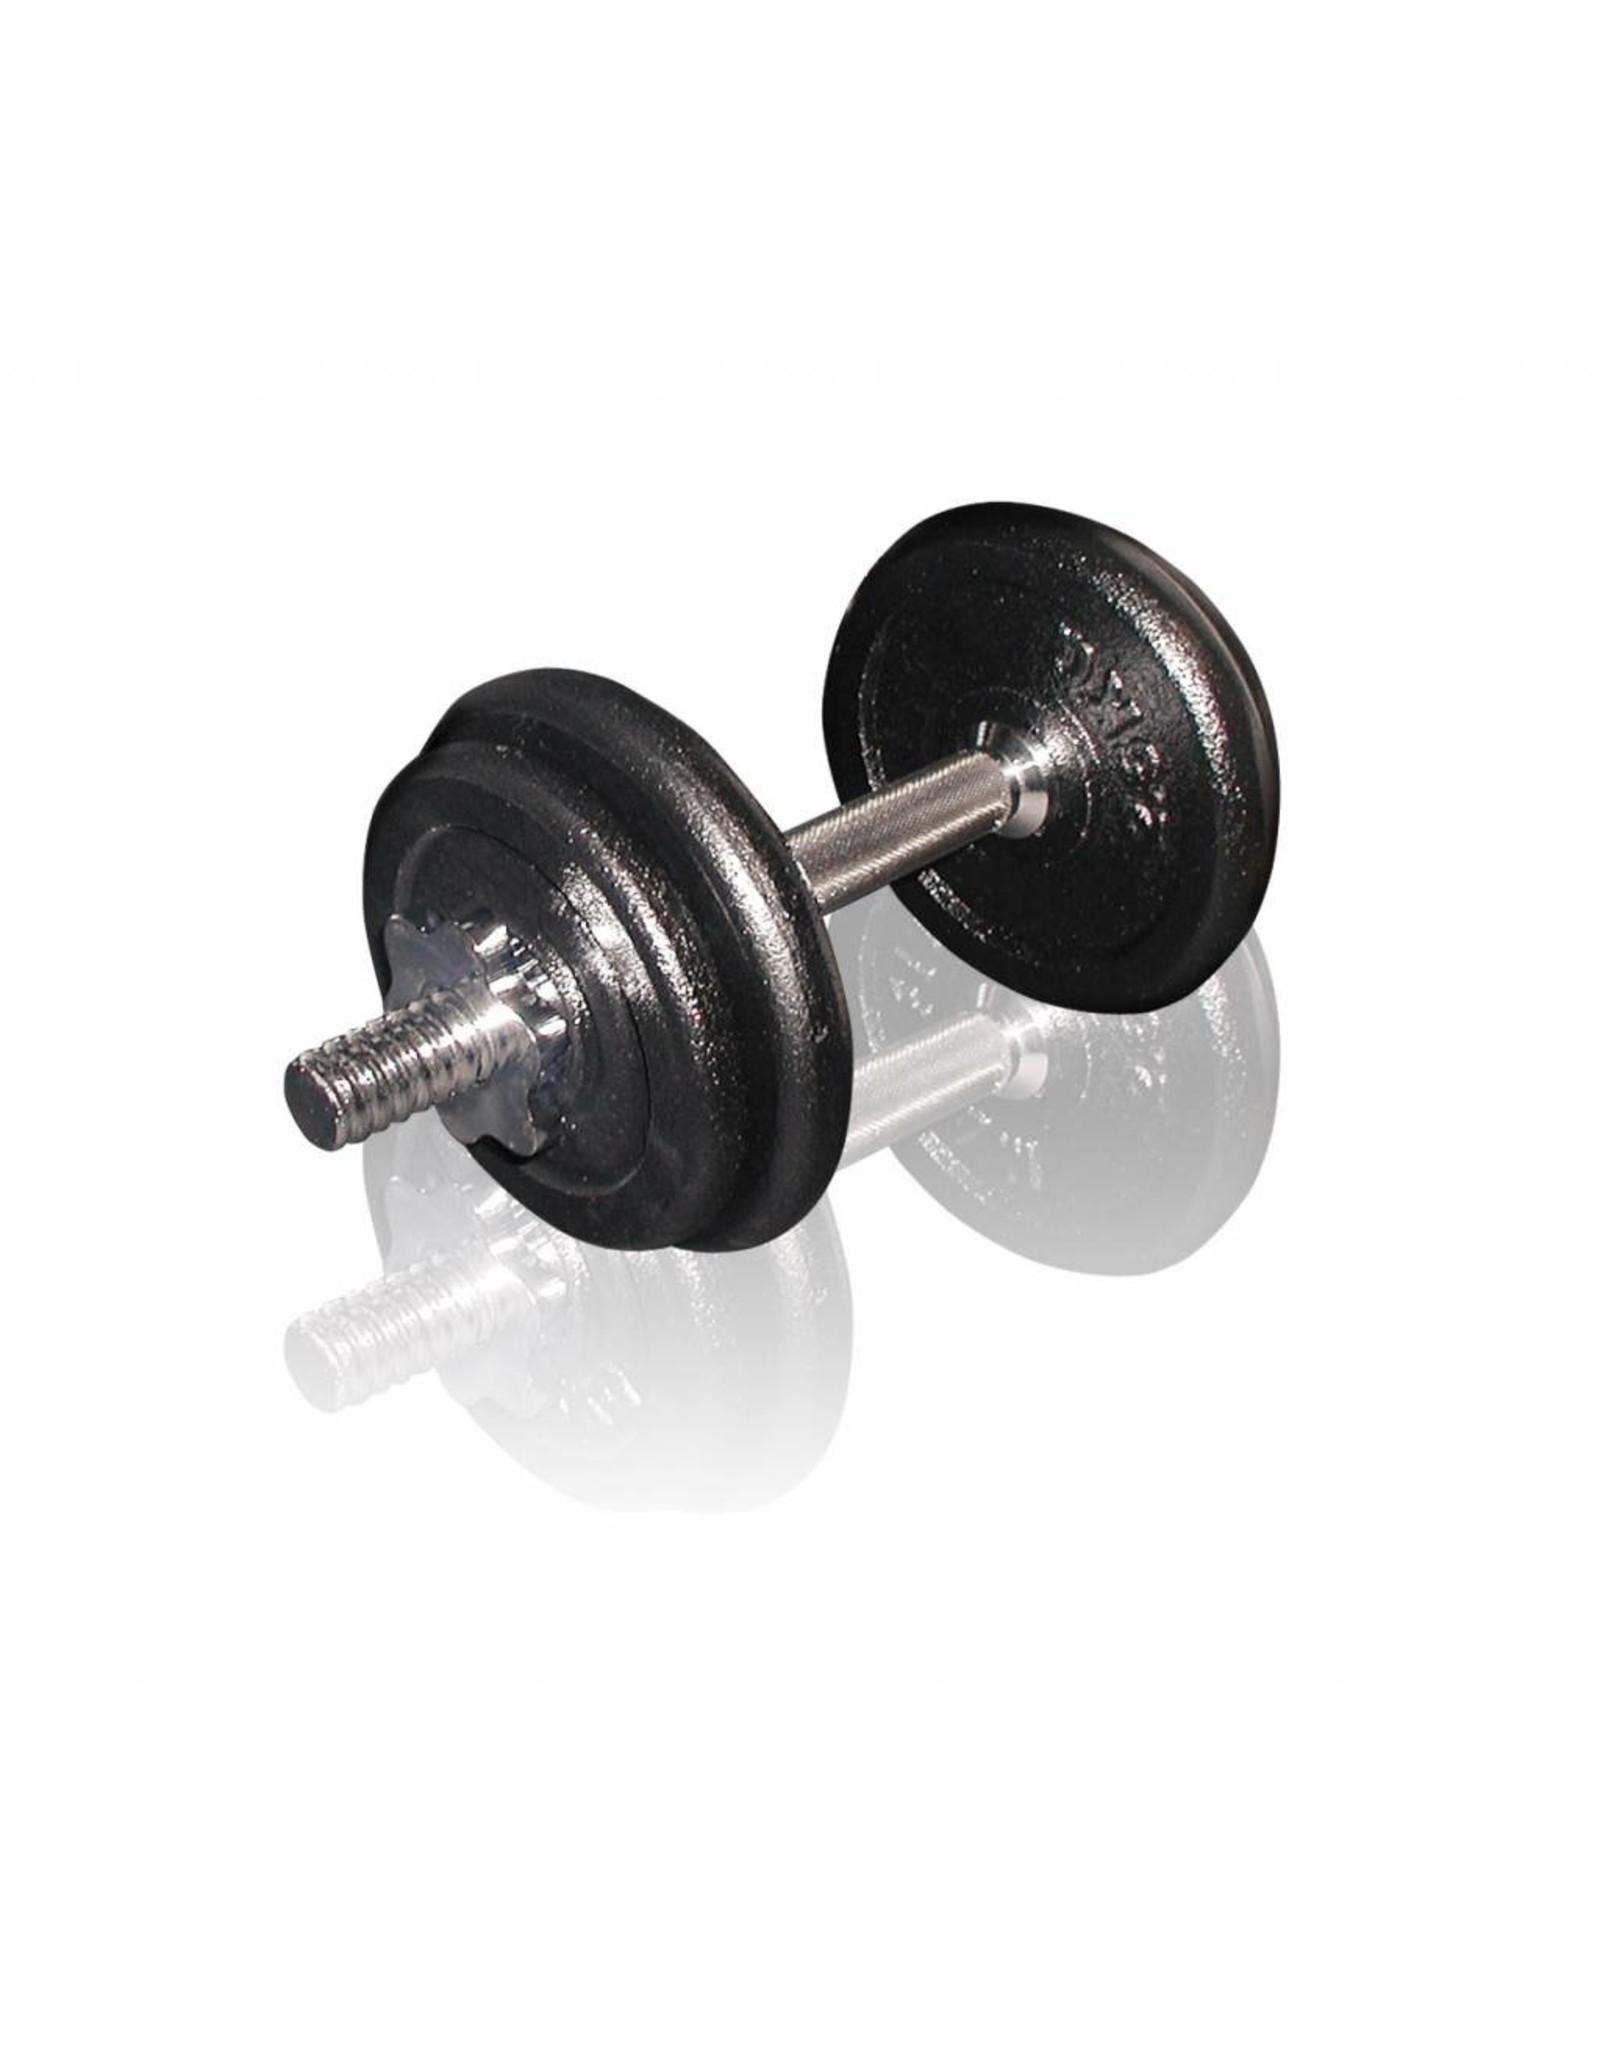 Toorx Fitness Toorx Fitness - Dumbbellset 10 kg - gietijzer - met Koffer